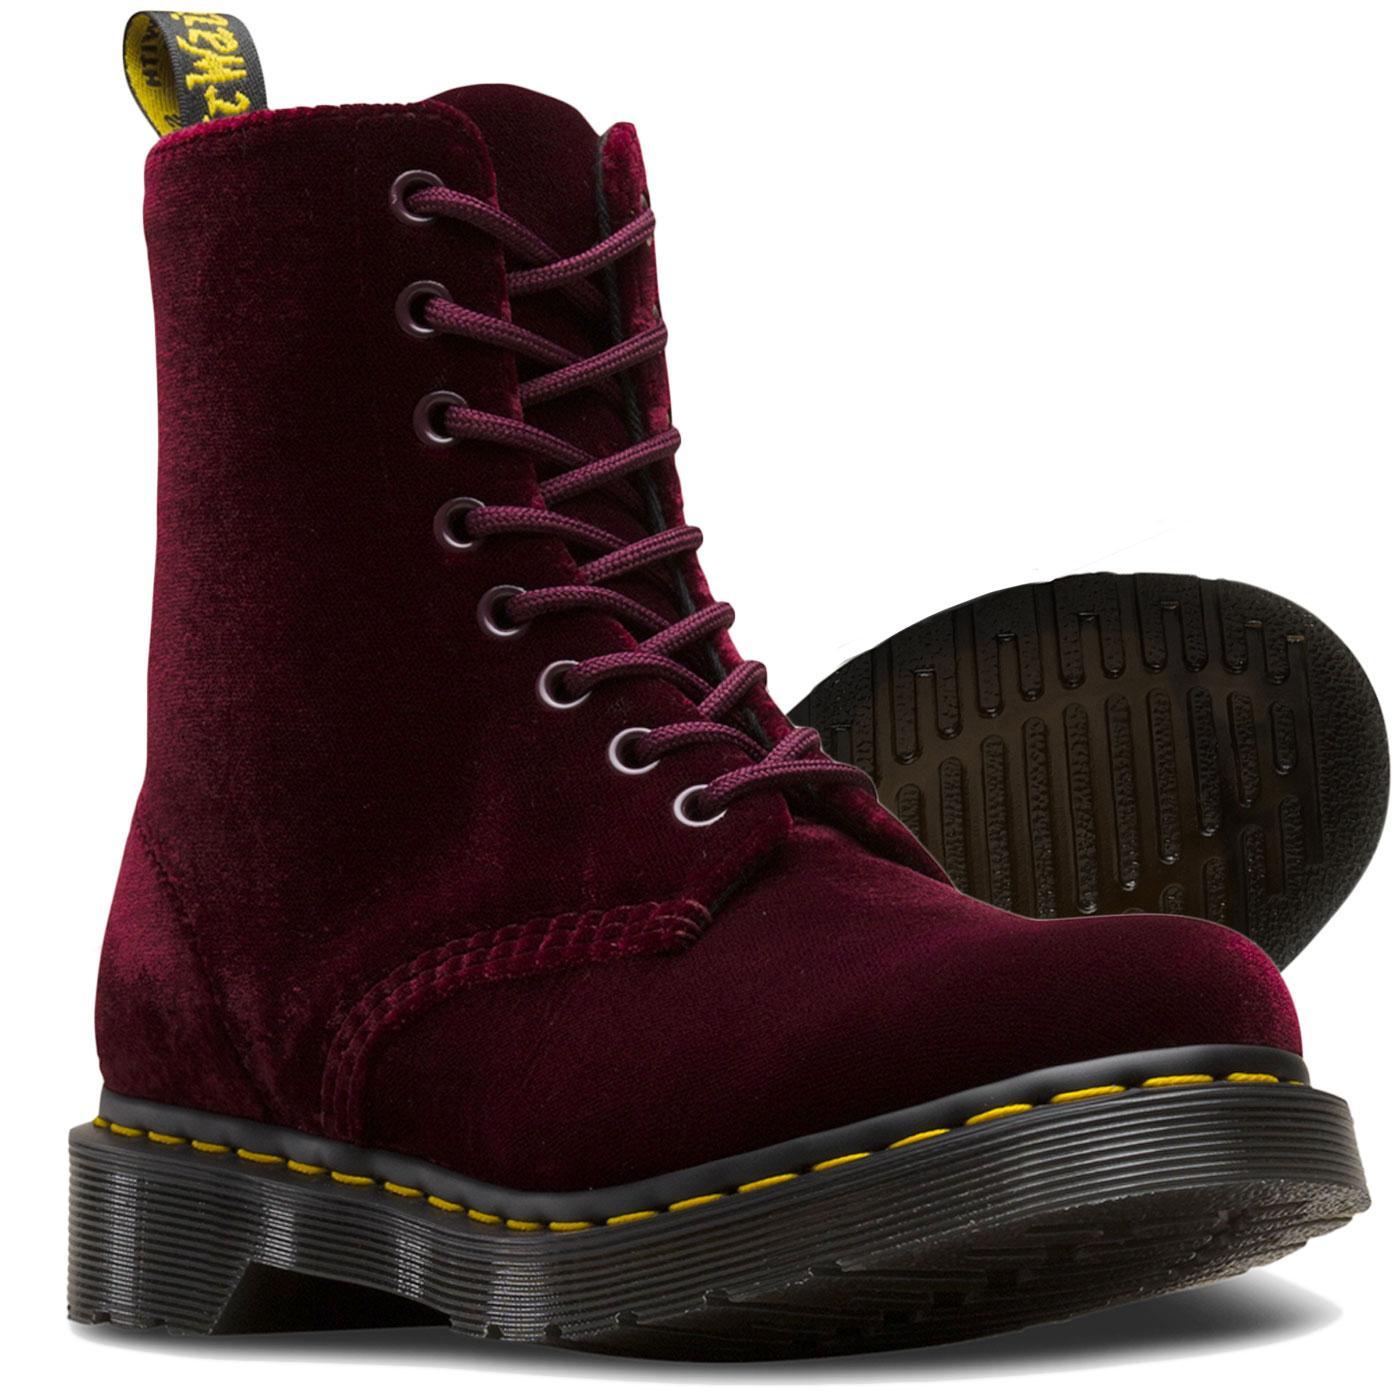 8c88faf3a 1460 Pascal Velvet DR MARTENS WOMENS Boots Cherry